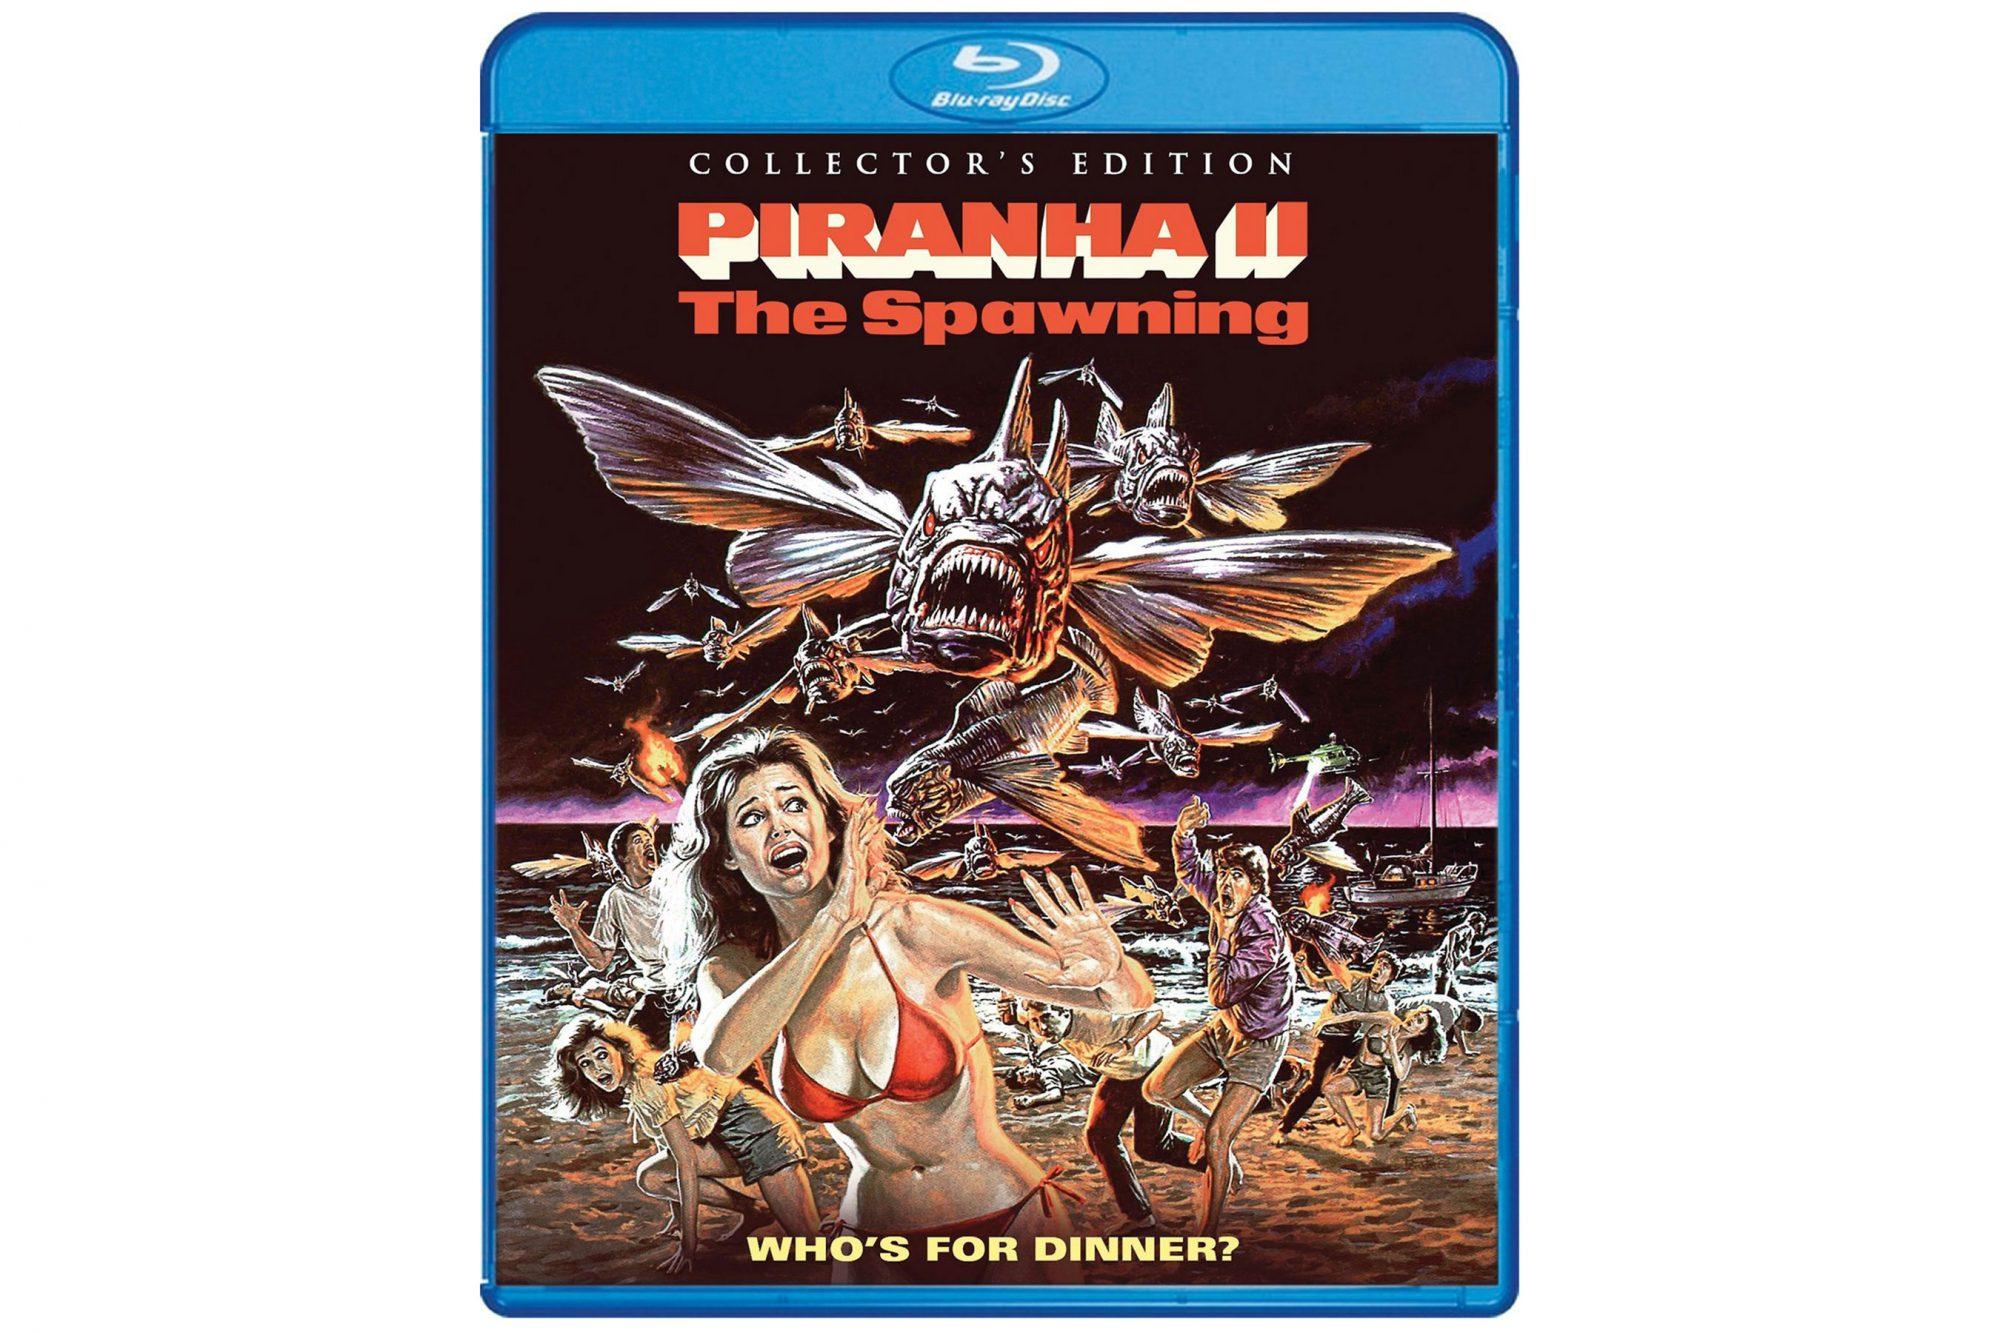 Piranha II